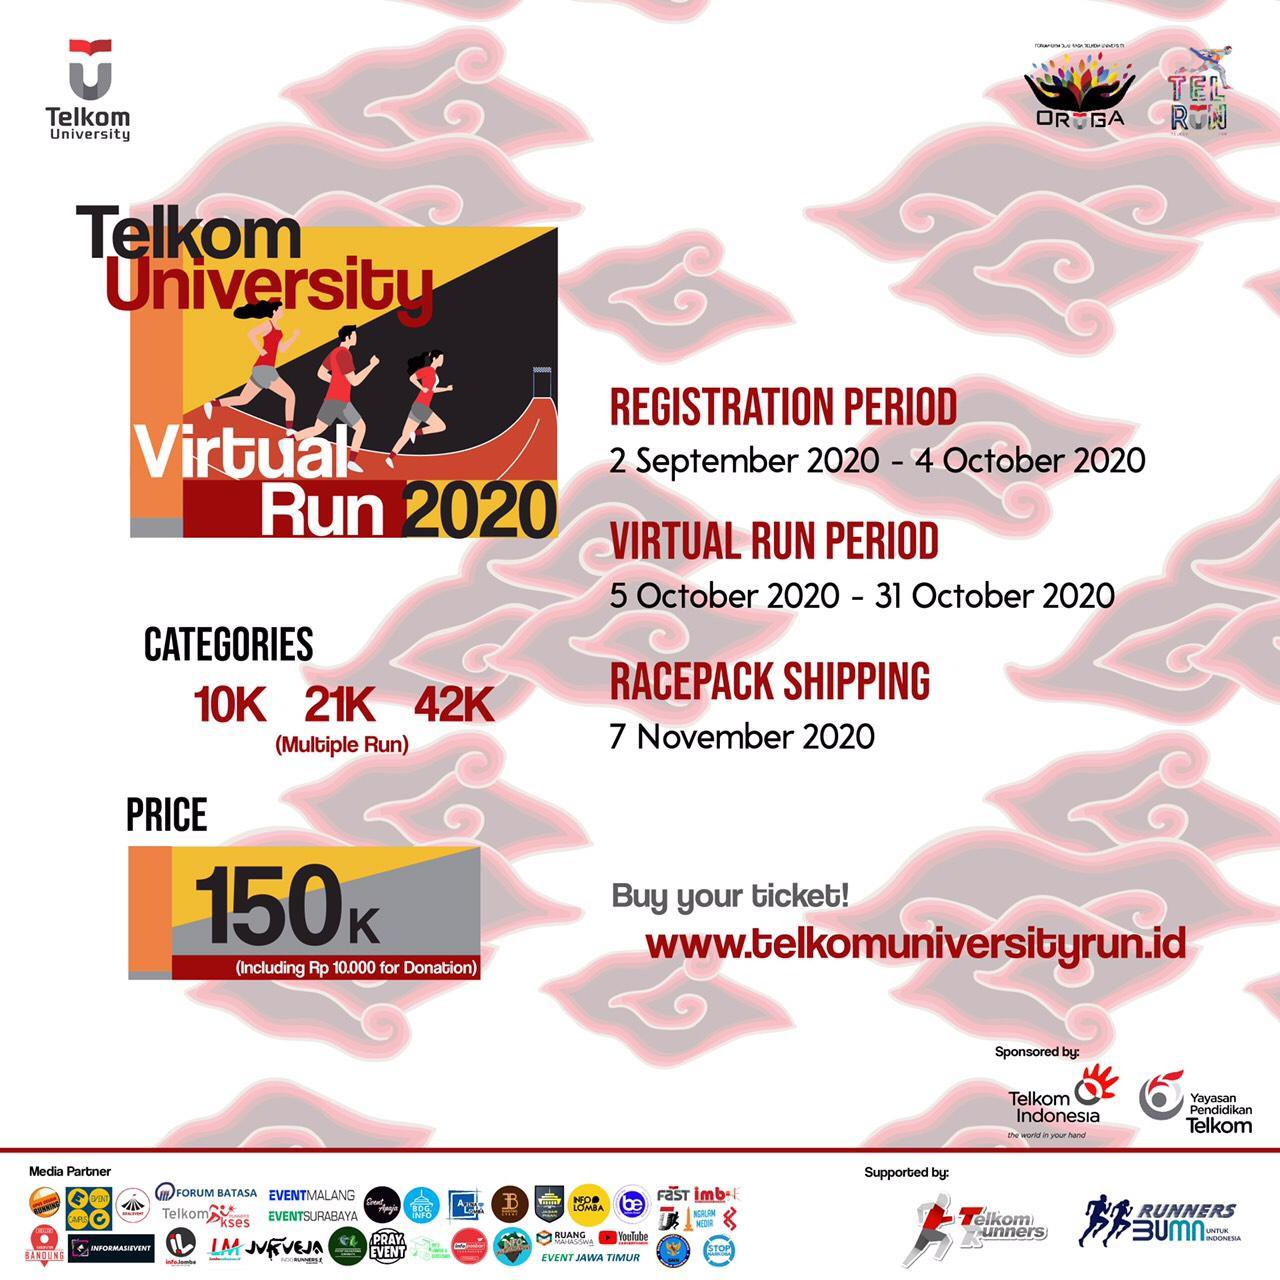 Telkom University Virtual Run - EVENTAPAAJA